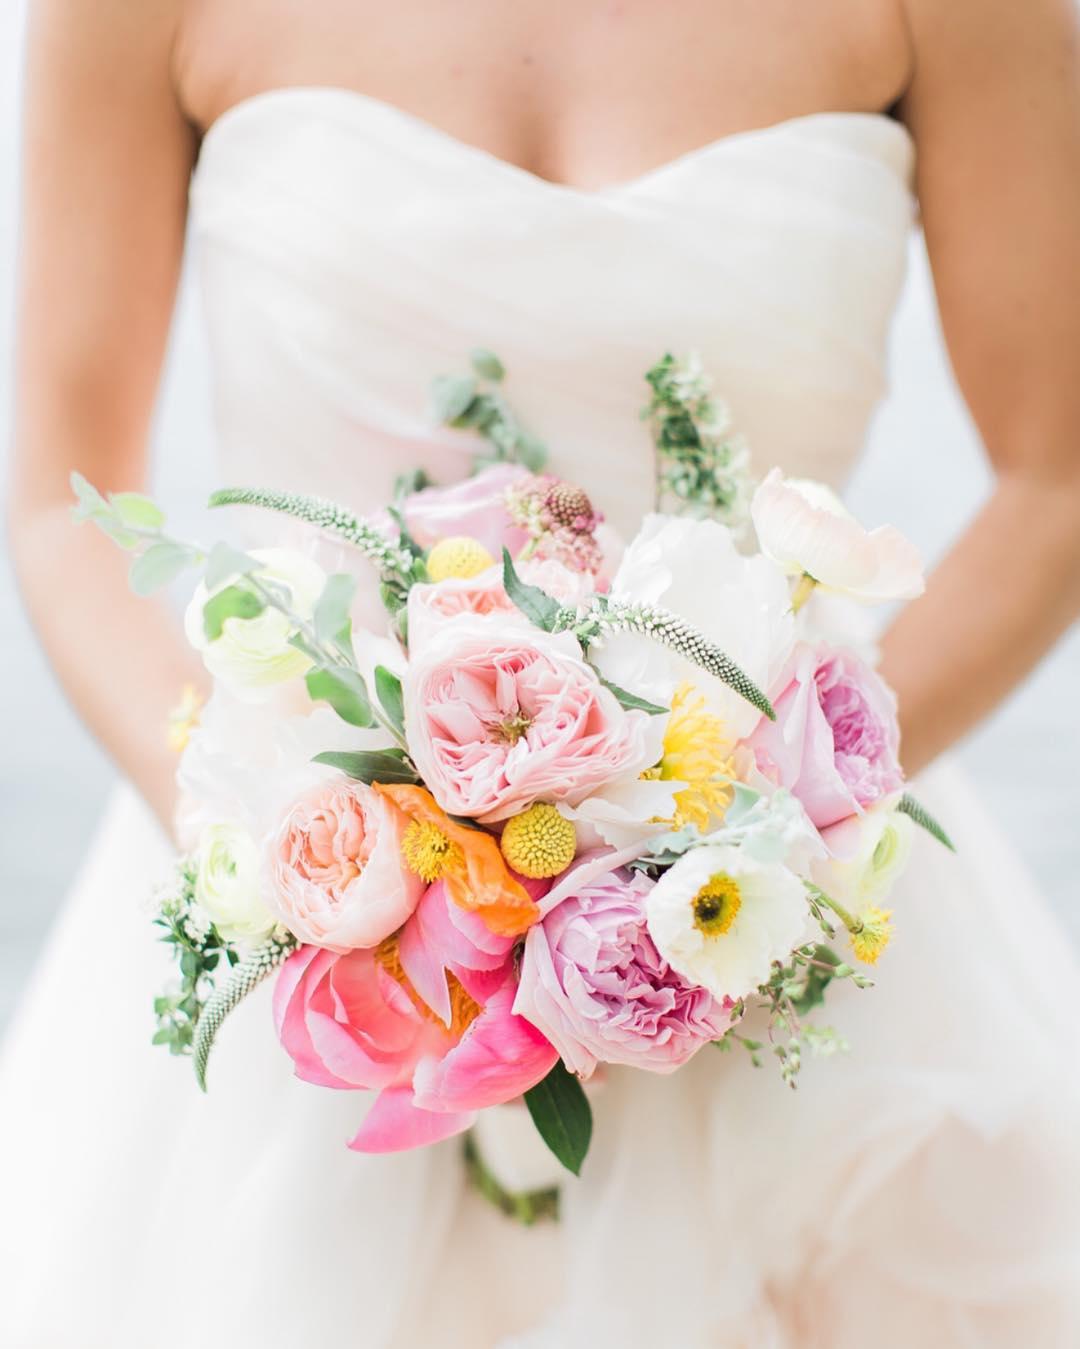 {pretty in pastel} photo | @monpetitstudio . planning/coordination | @nhwedplanner . . #bride #bouquet #weddingday #forever #ido #prettyflowers #weddingflowers #weddingdesign #peonies #poppies #gardenroses #pastels #flowers #lotusfloraldesigns #weddingflorist #nhwedding #love